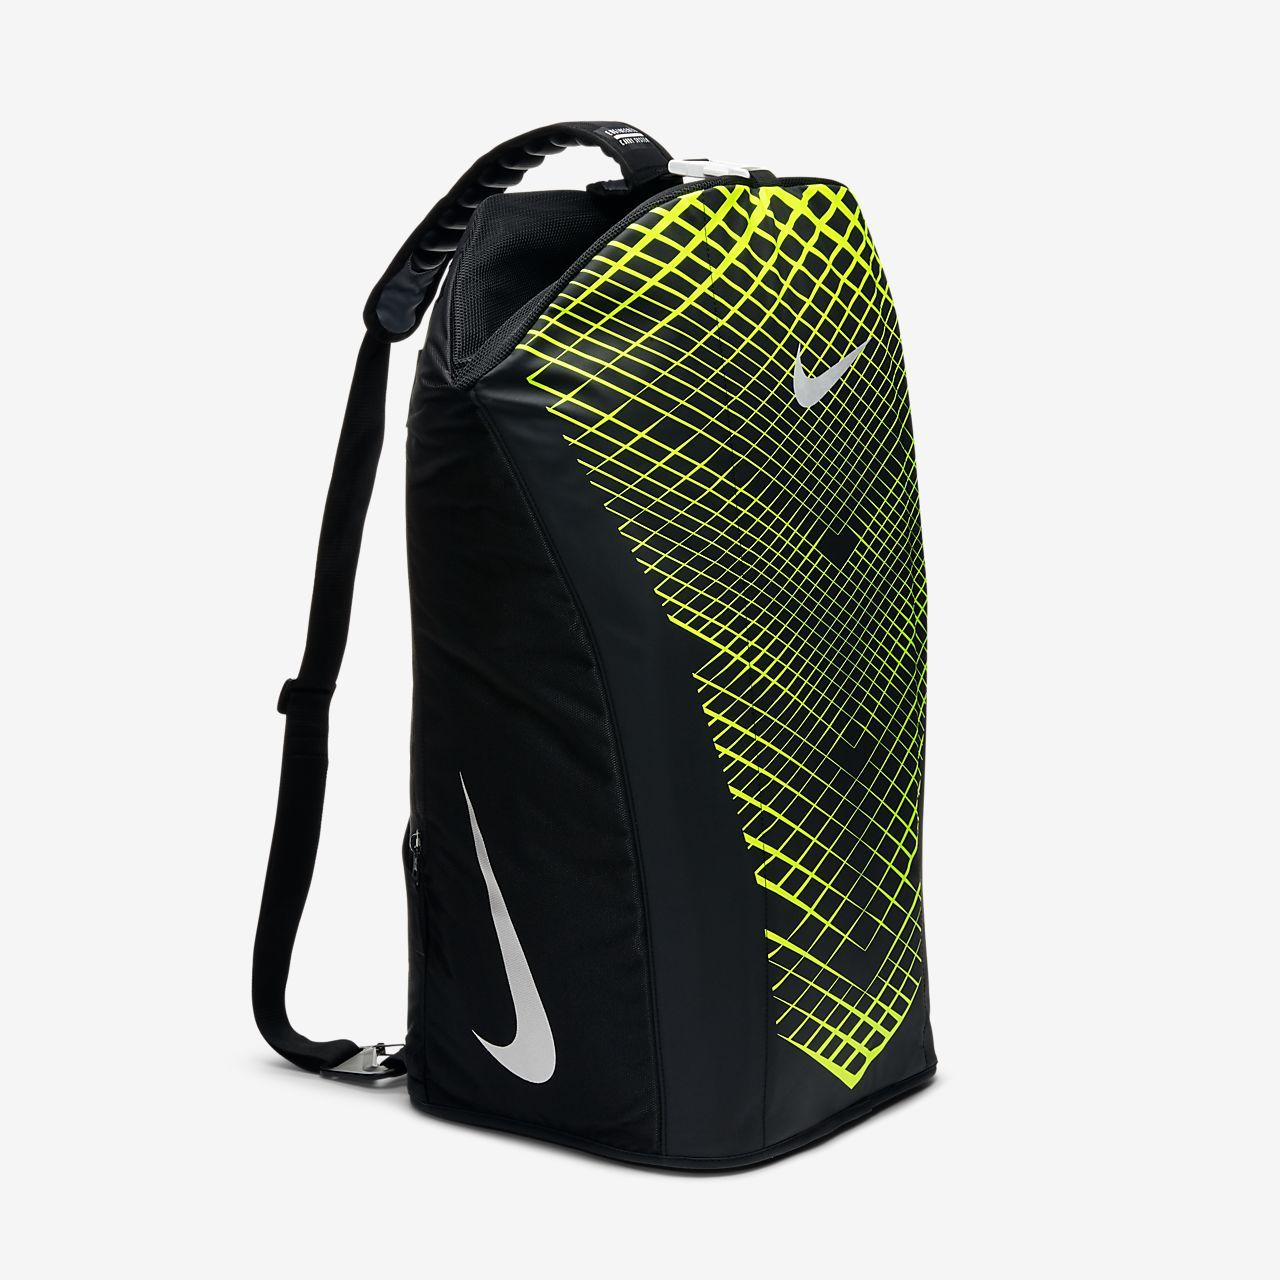 410b1c89cb8eb5 Buy bag nike air max   up to 77% Discounts